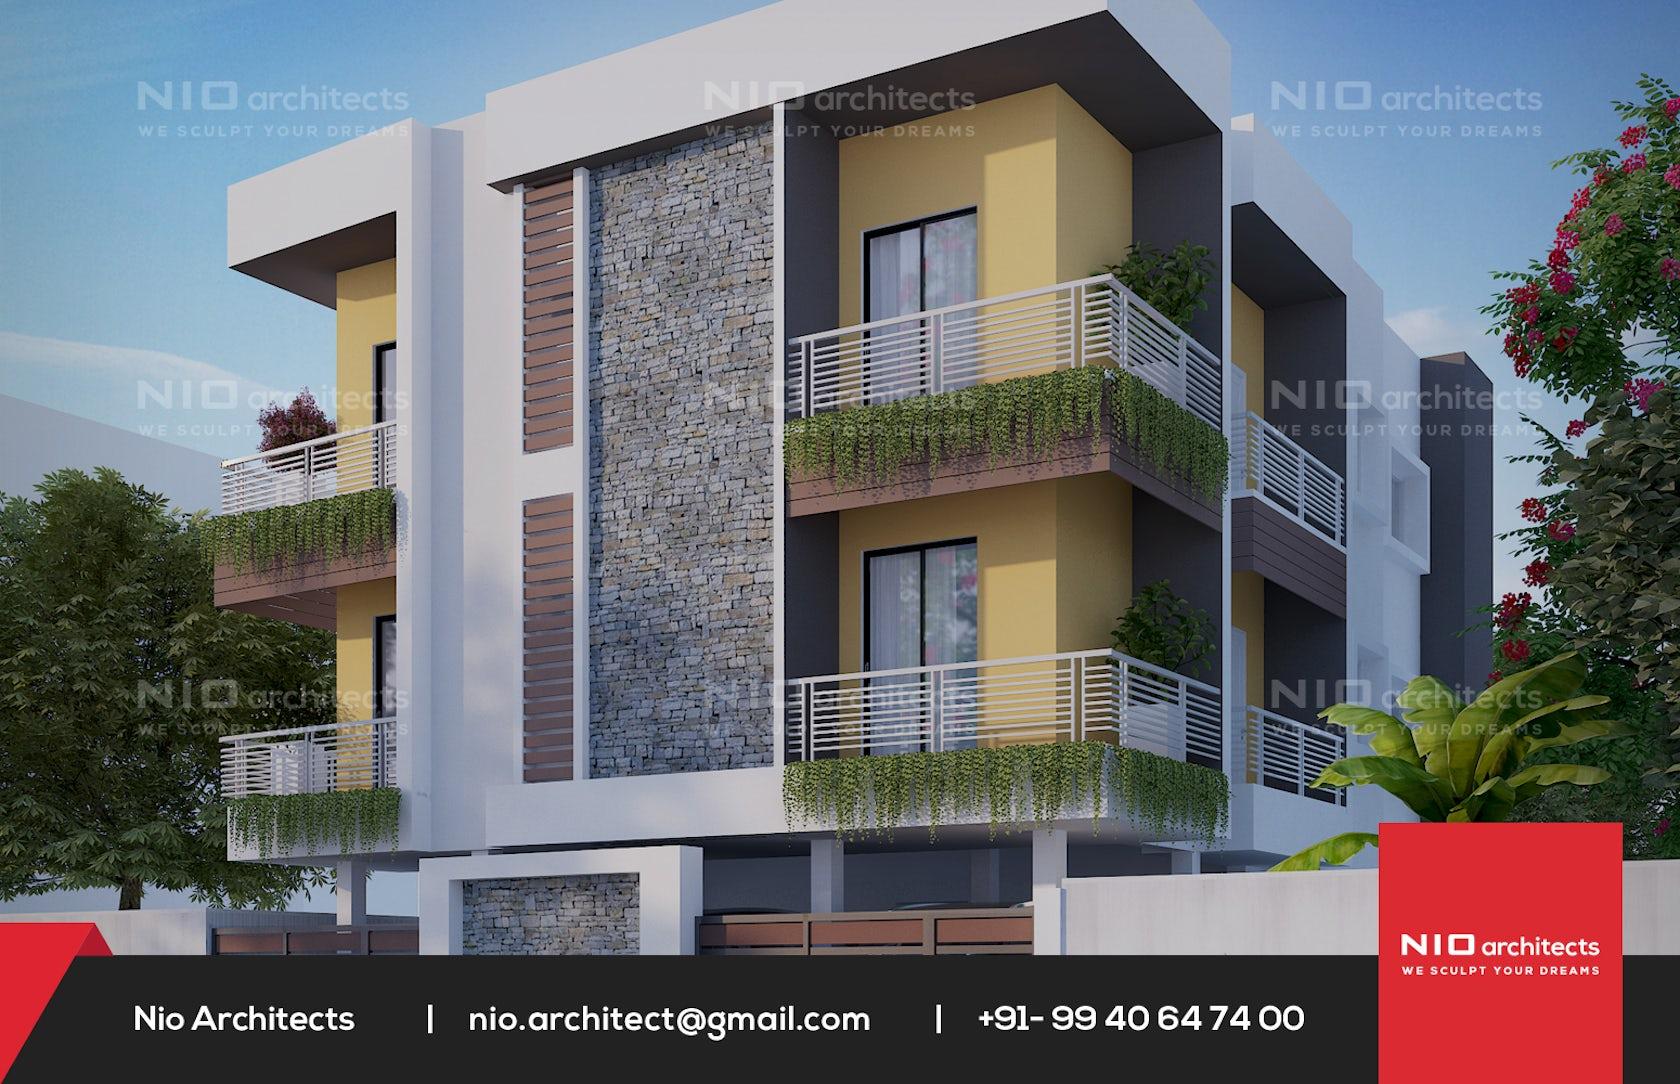 nio architects on architizer